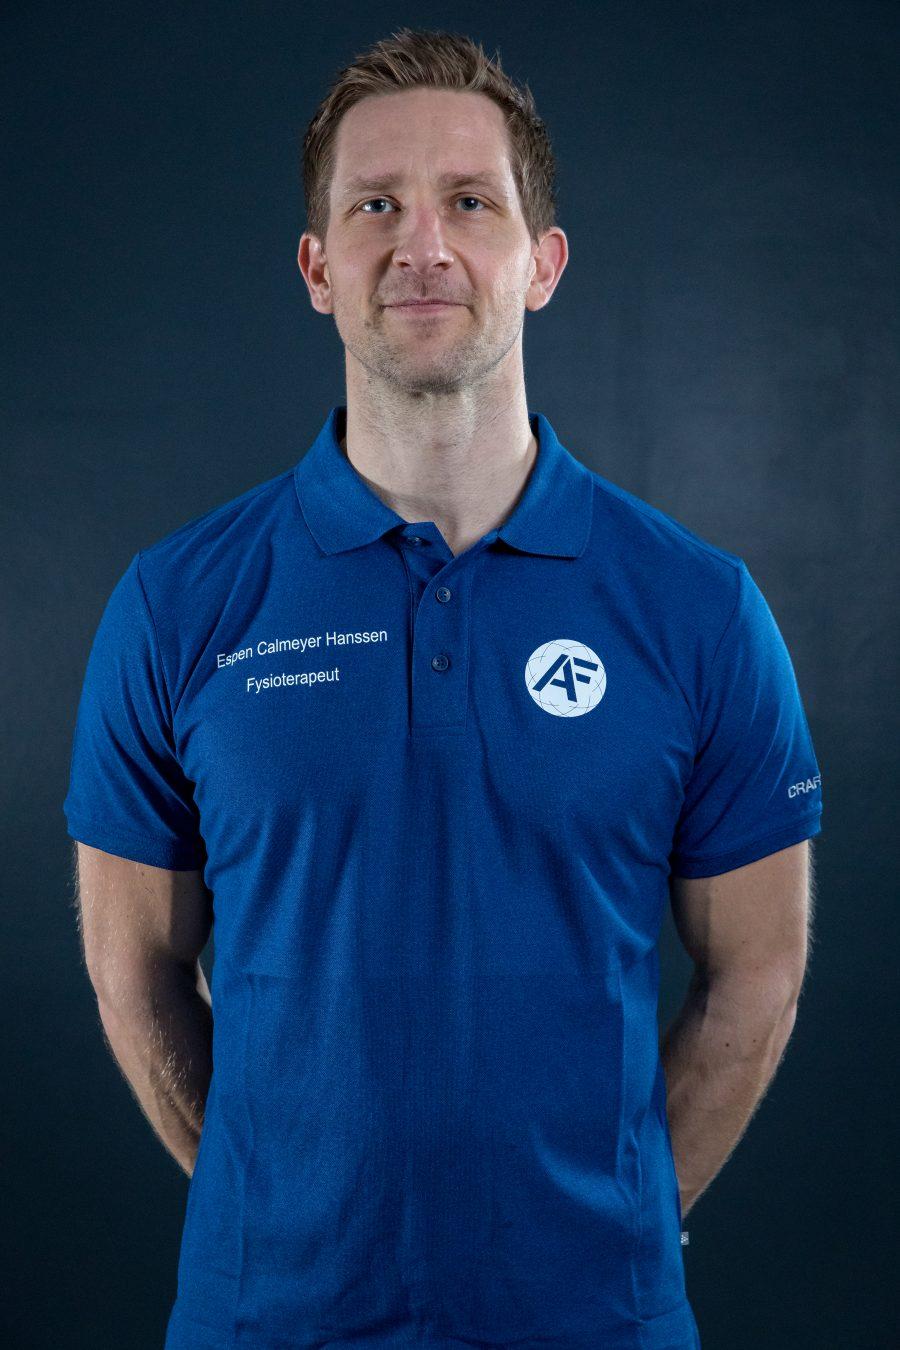 Espen Calmeyer Hanssen